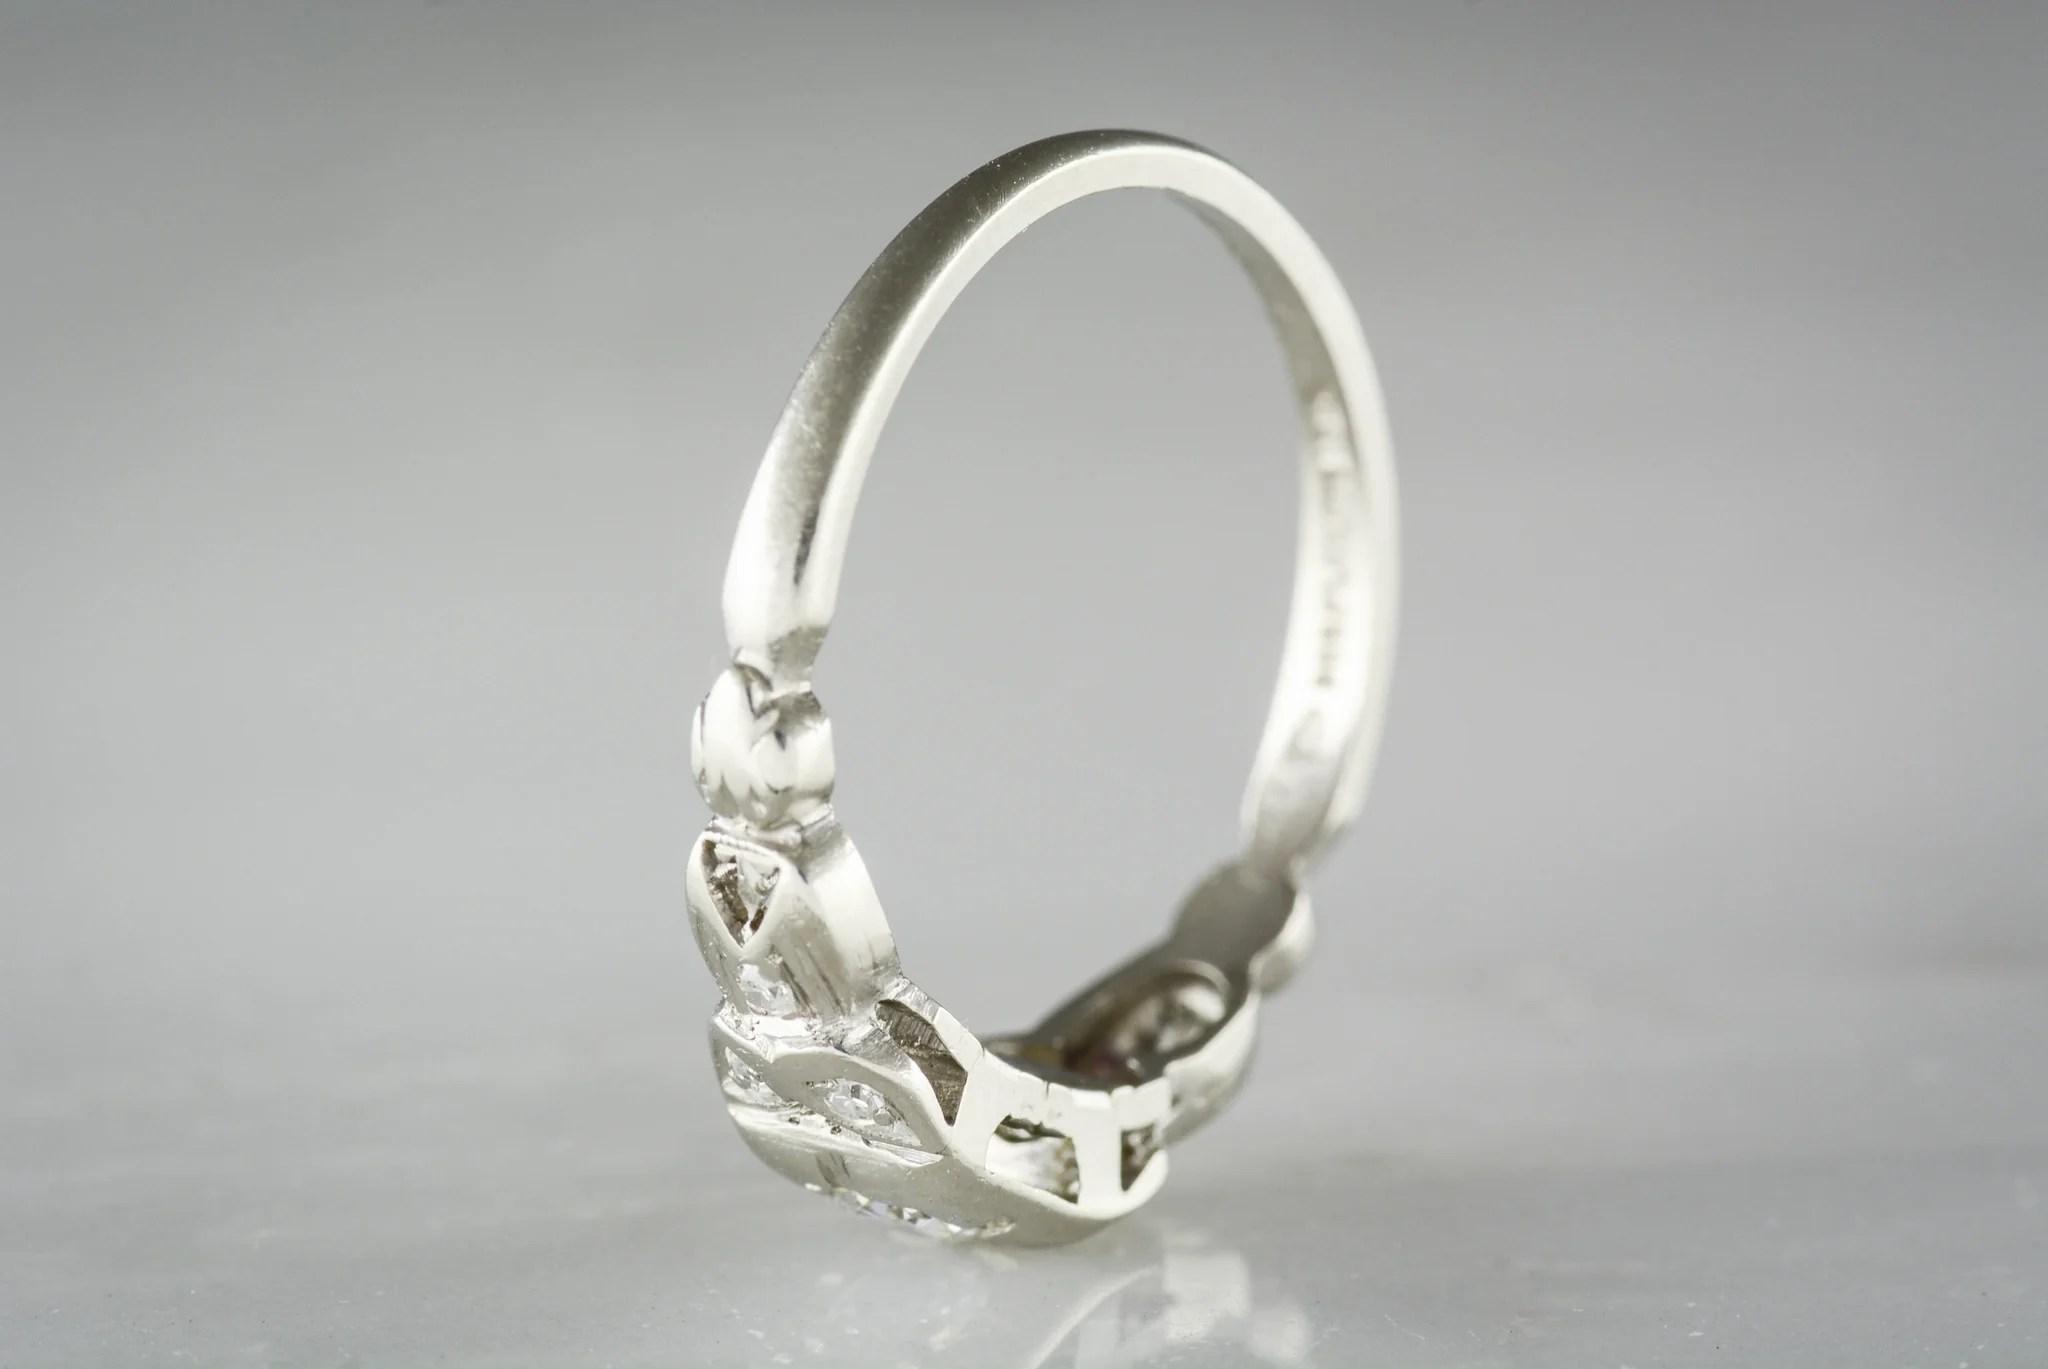 antique old european cut diamond in platinum c s art deco early retro engagement ring with owl motif owl wedding ring Antique Old European Cut Diamond in Platinum c s Art Deco Early Retro Engagement Ring with Owl Motif